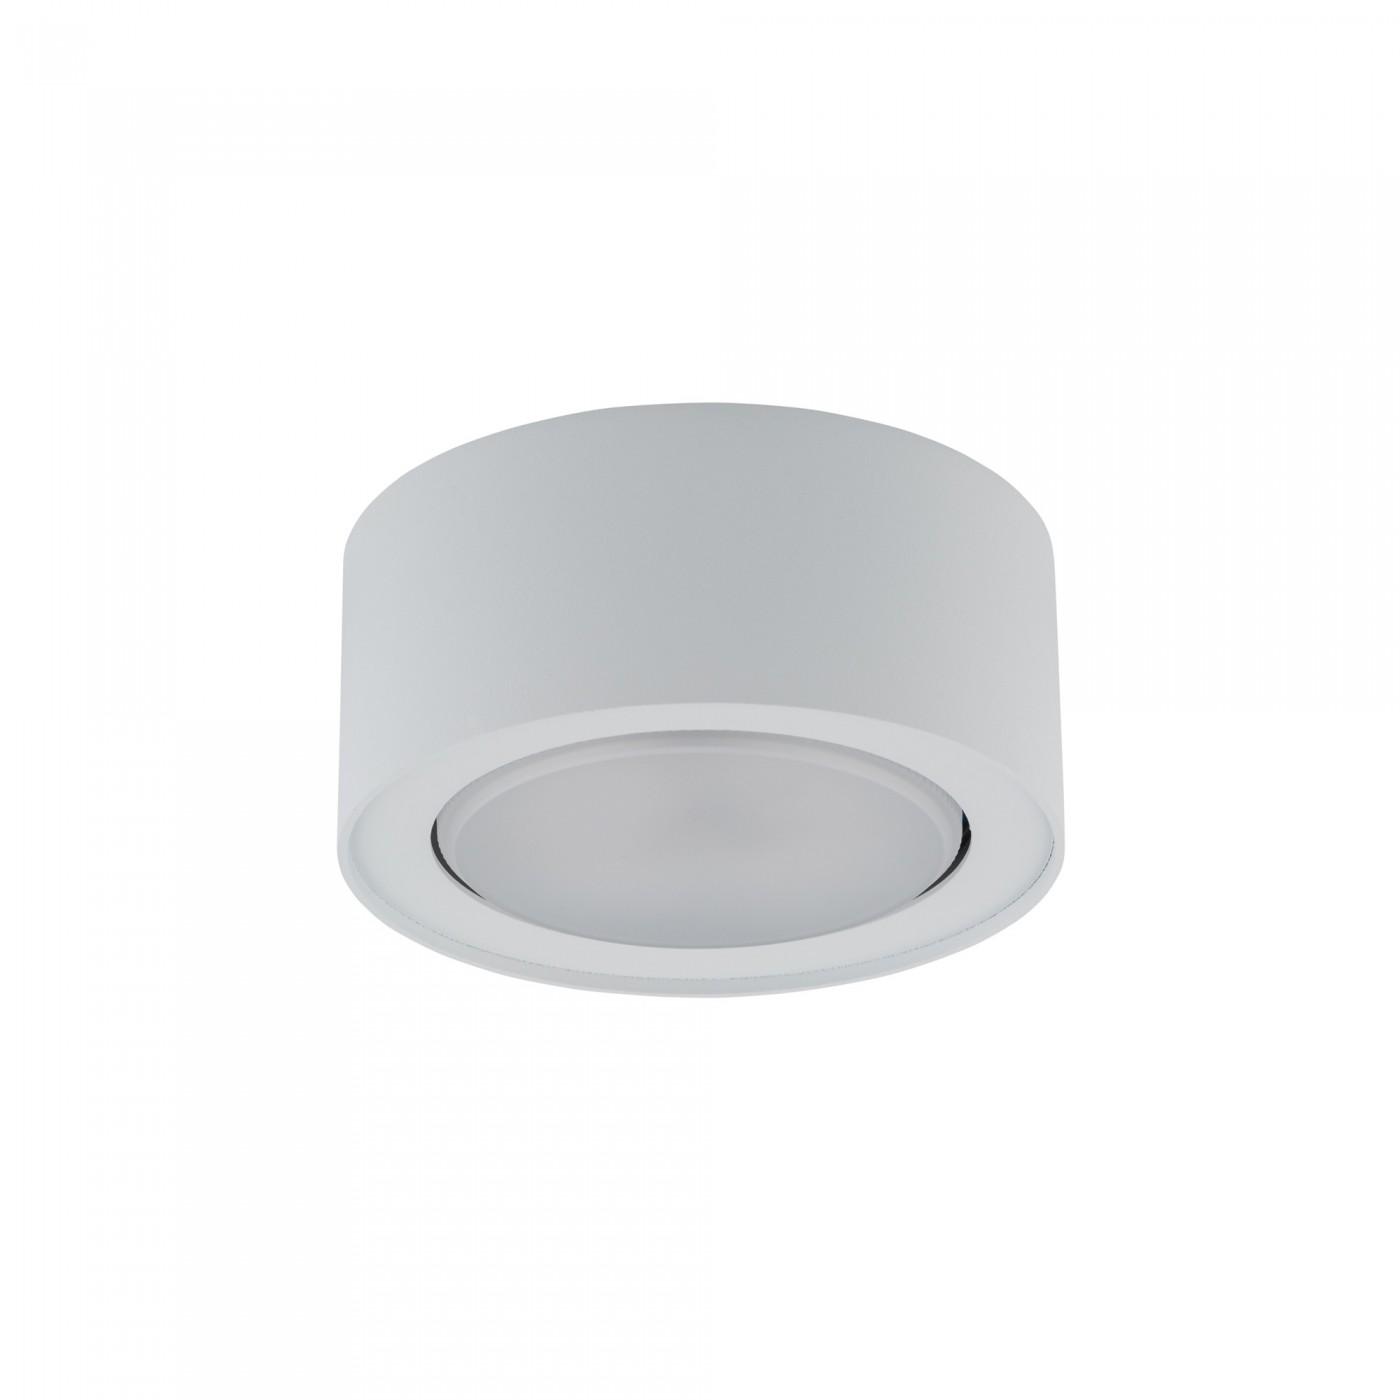 FLEA  white 8202 Nowodvorski Lighting